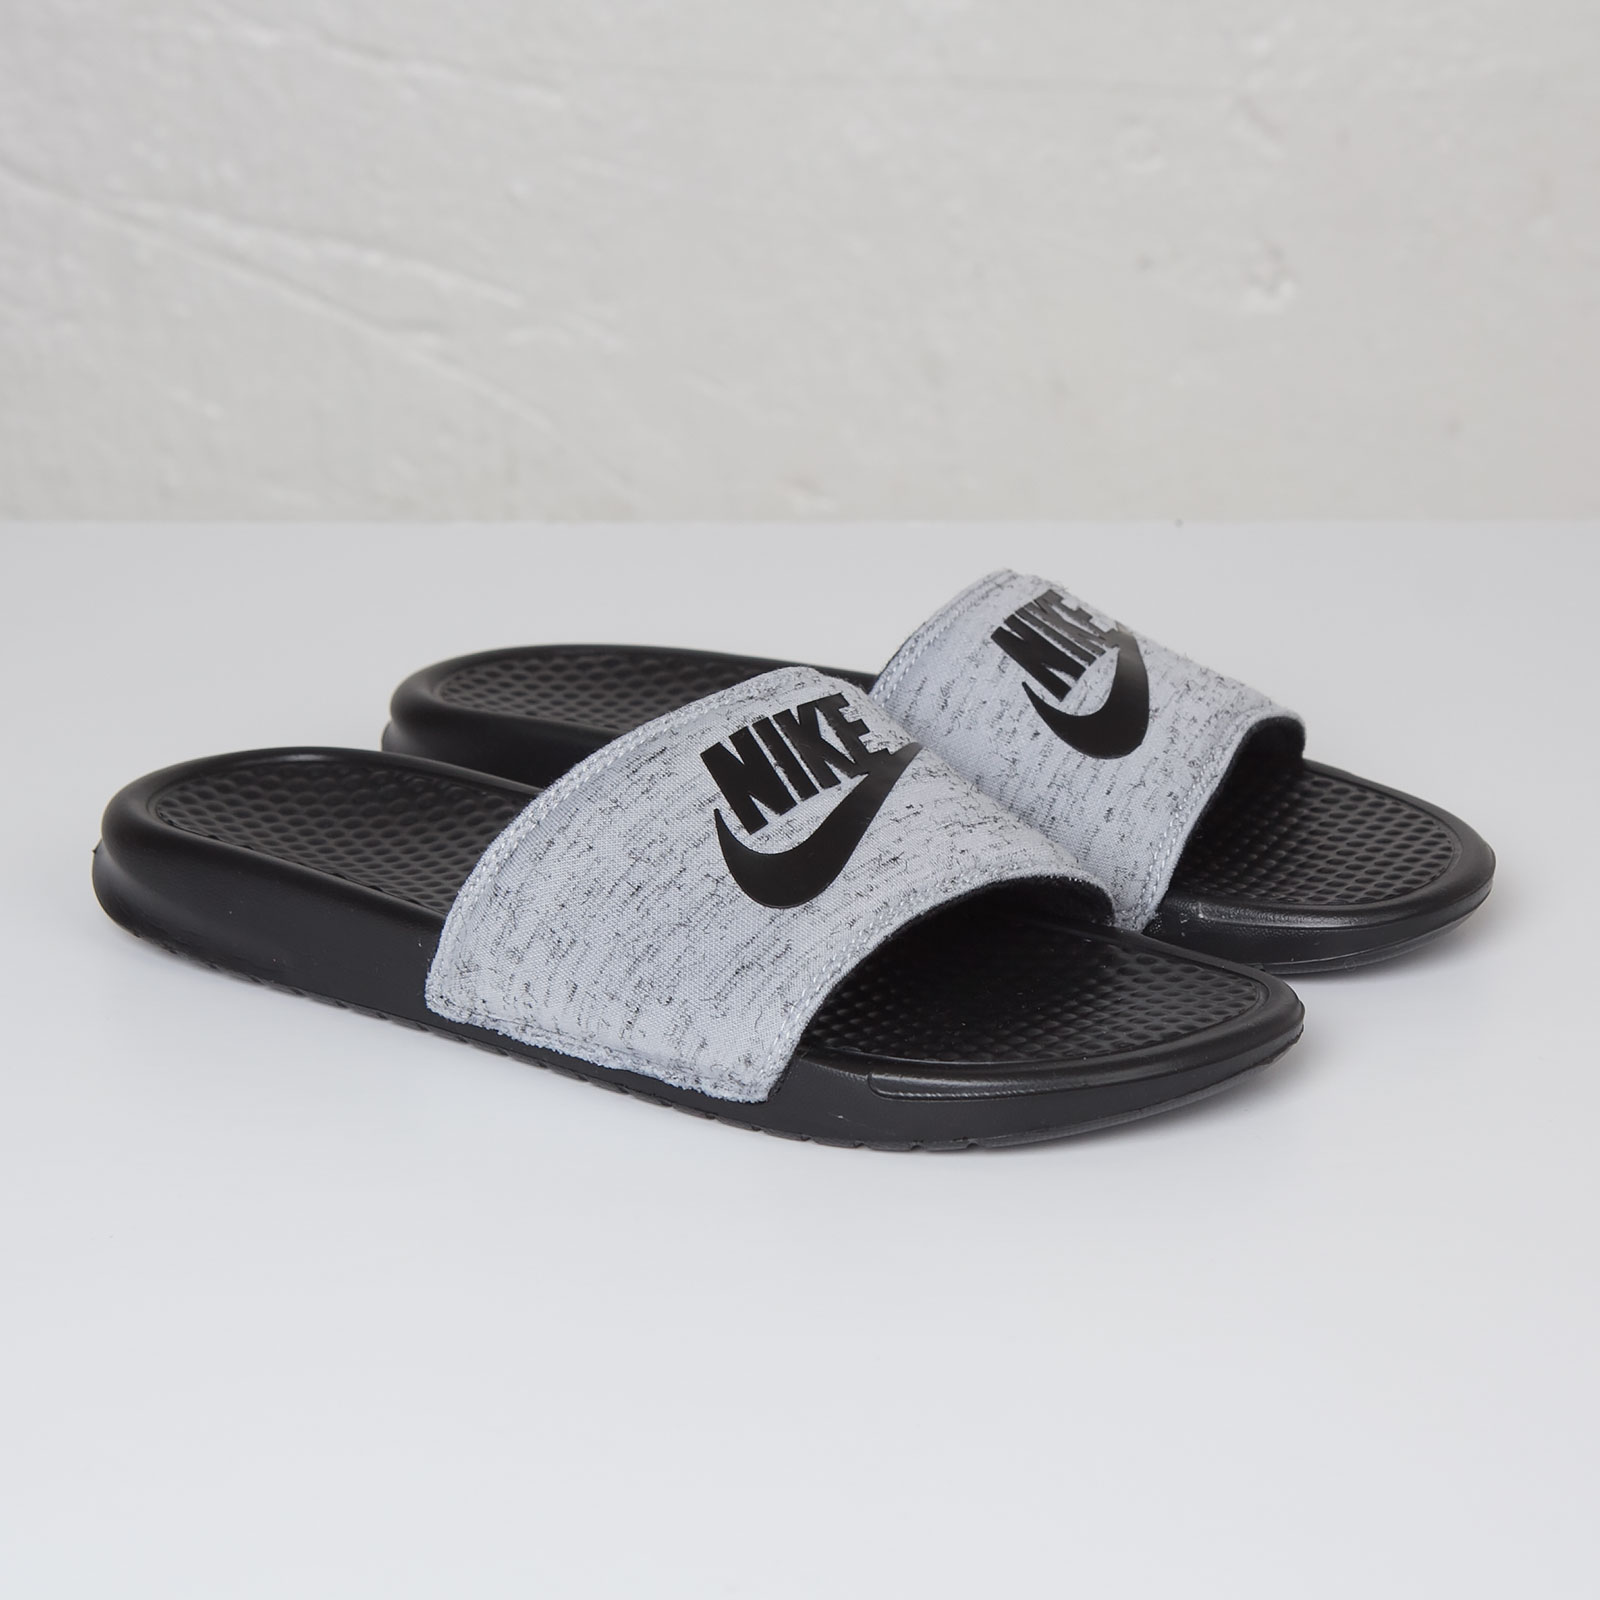 cb270a8a703f Nike Benassi JDI Fleece QS - 822020-001 - Sneakersnstuff